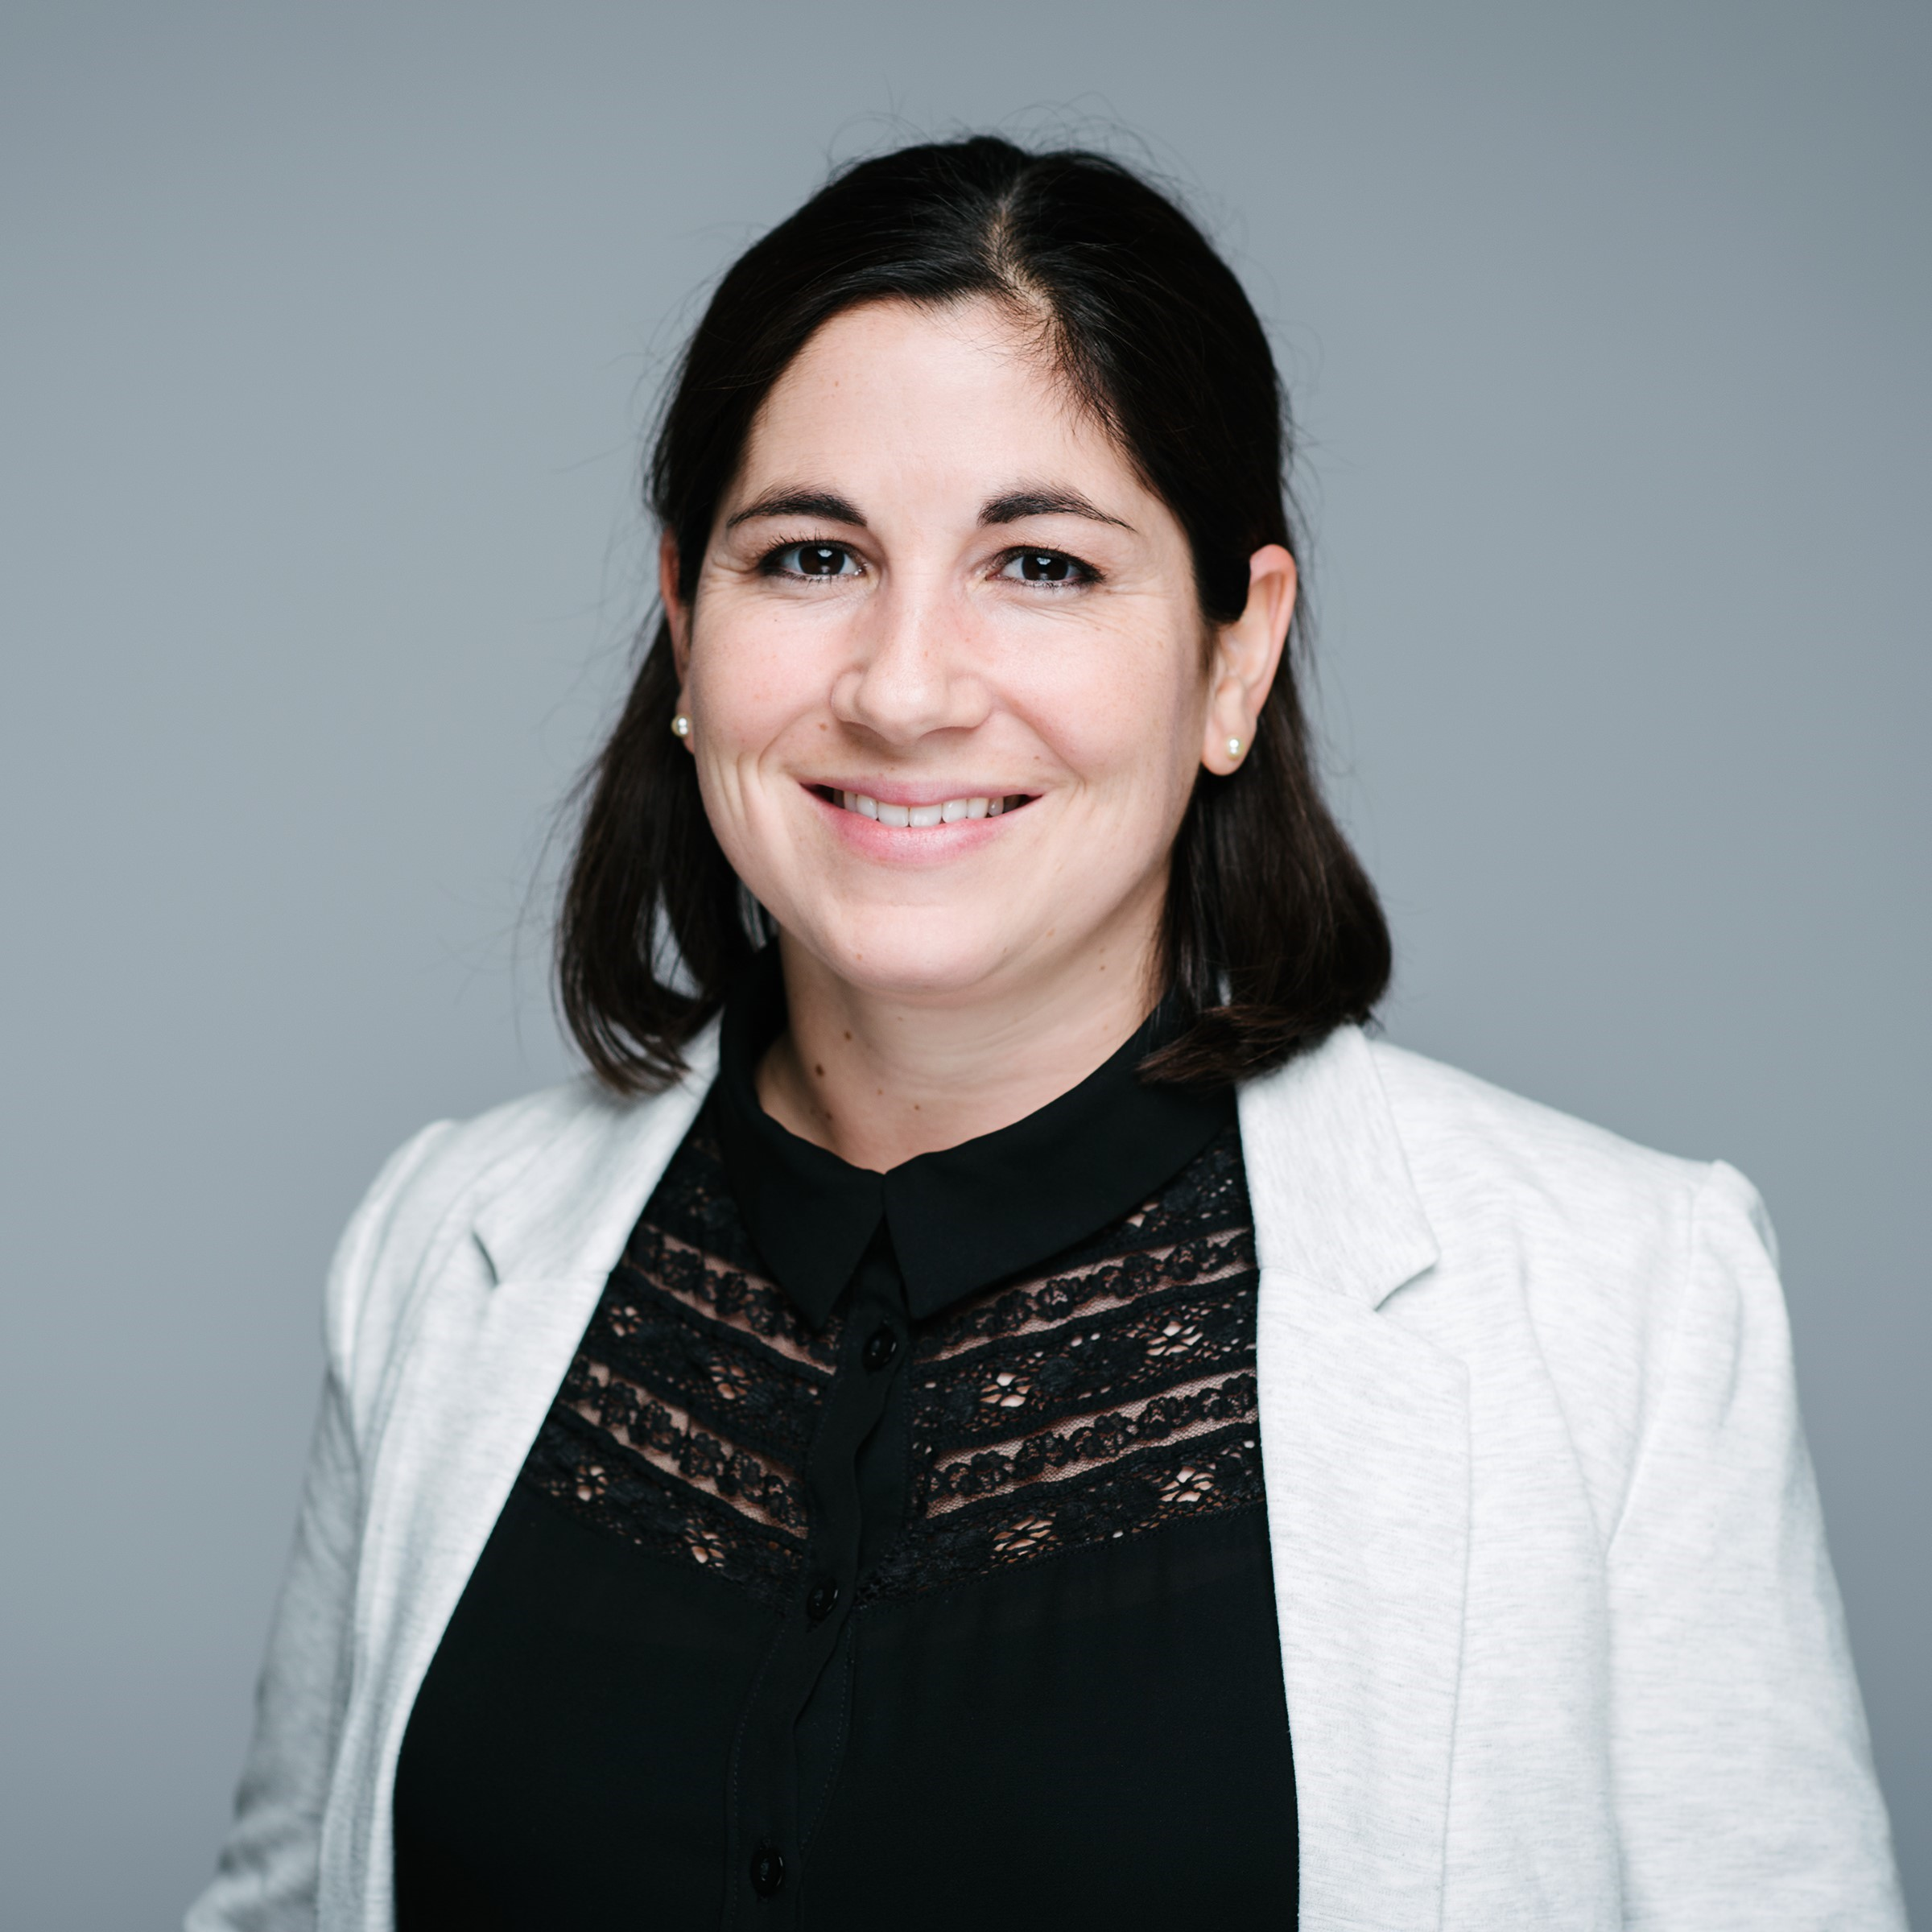 Lisa Demmerle